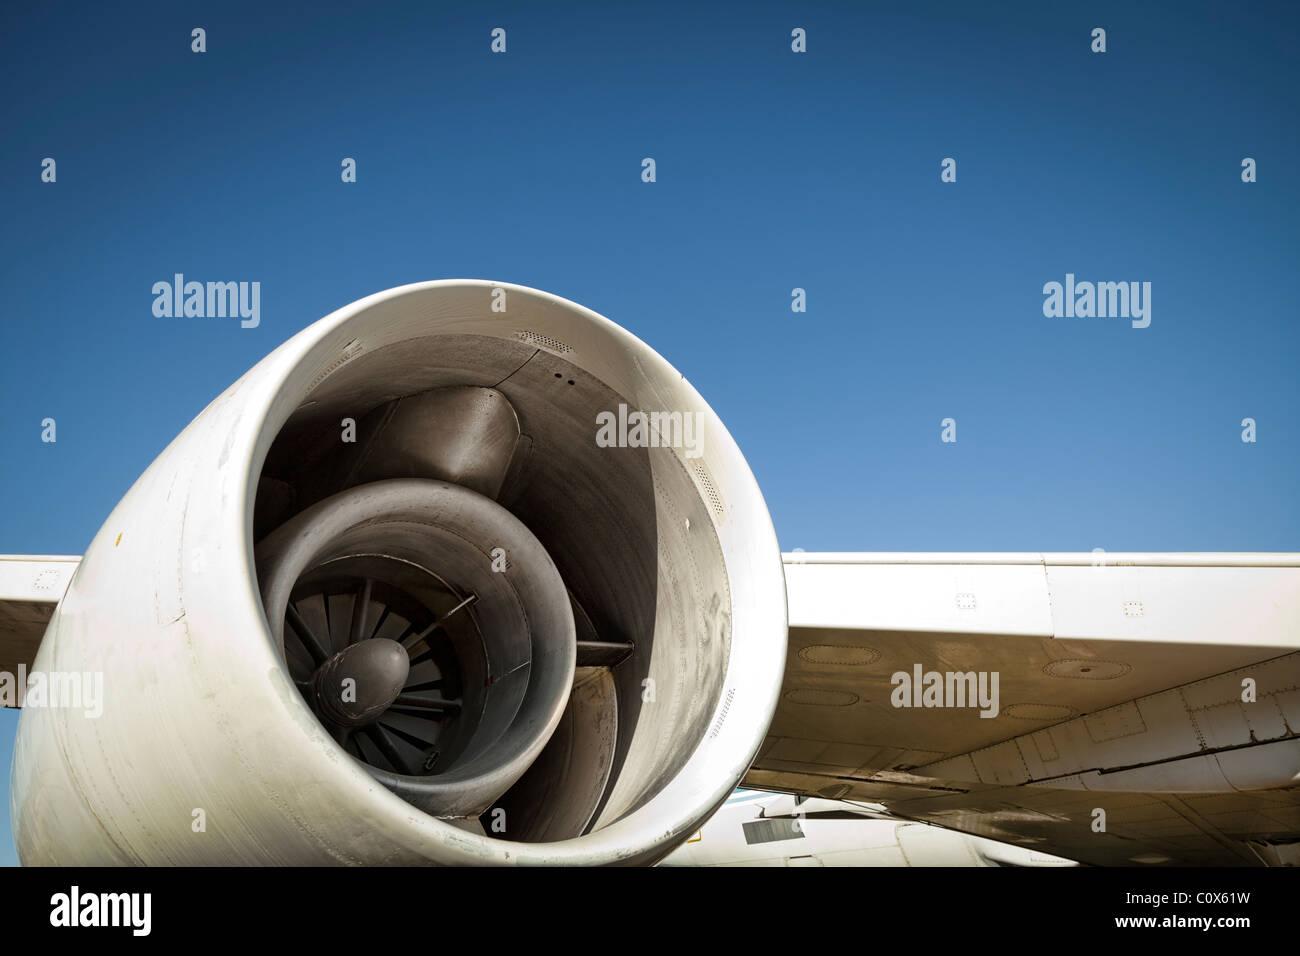 Jet aircraft plane details against blue sky. Engine.  Aircraft:  Convair CV-990 - Stock Image